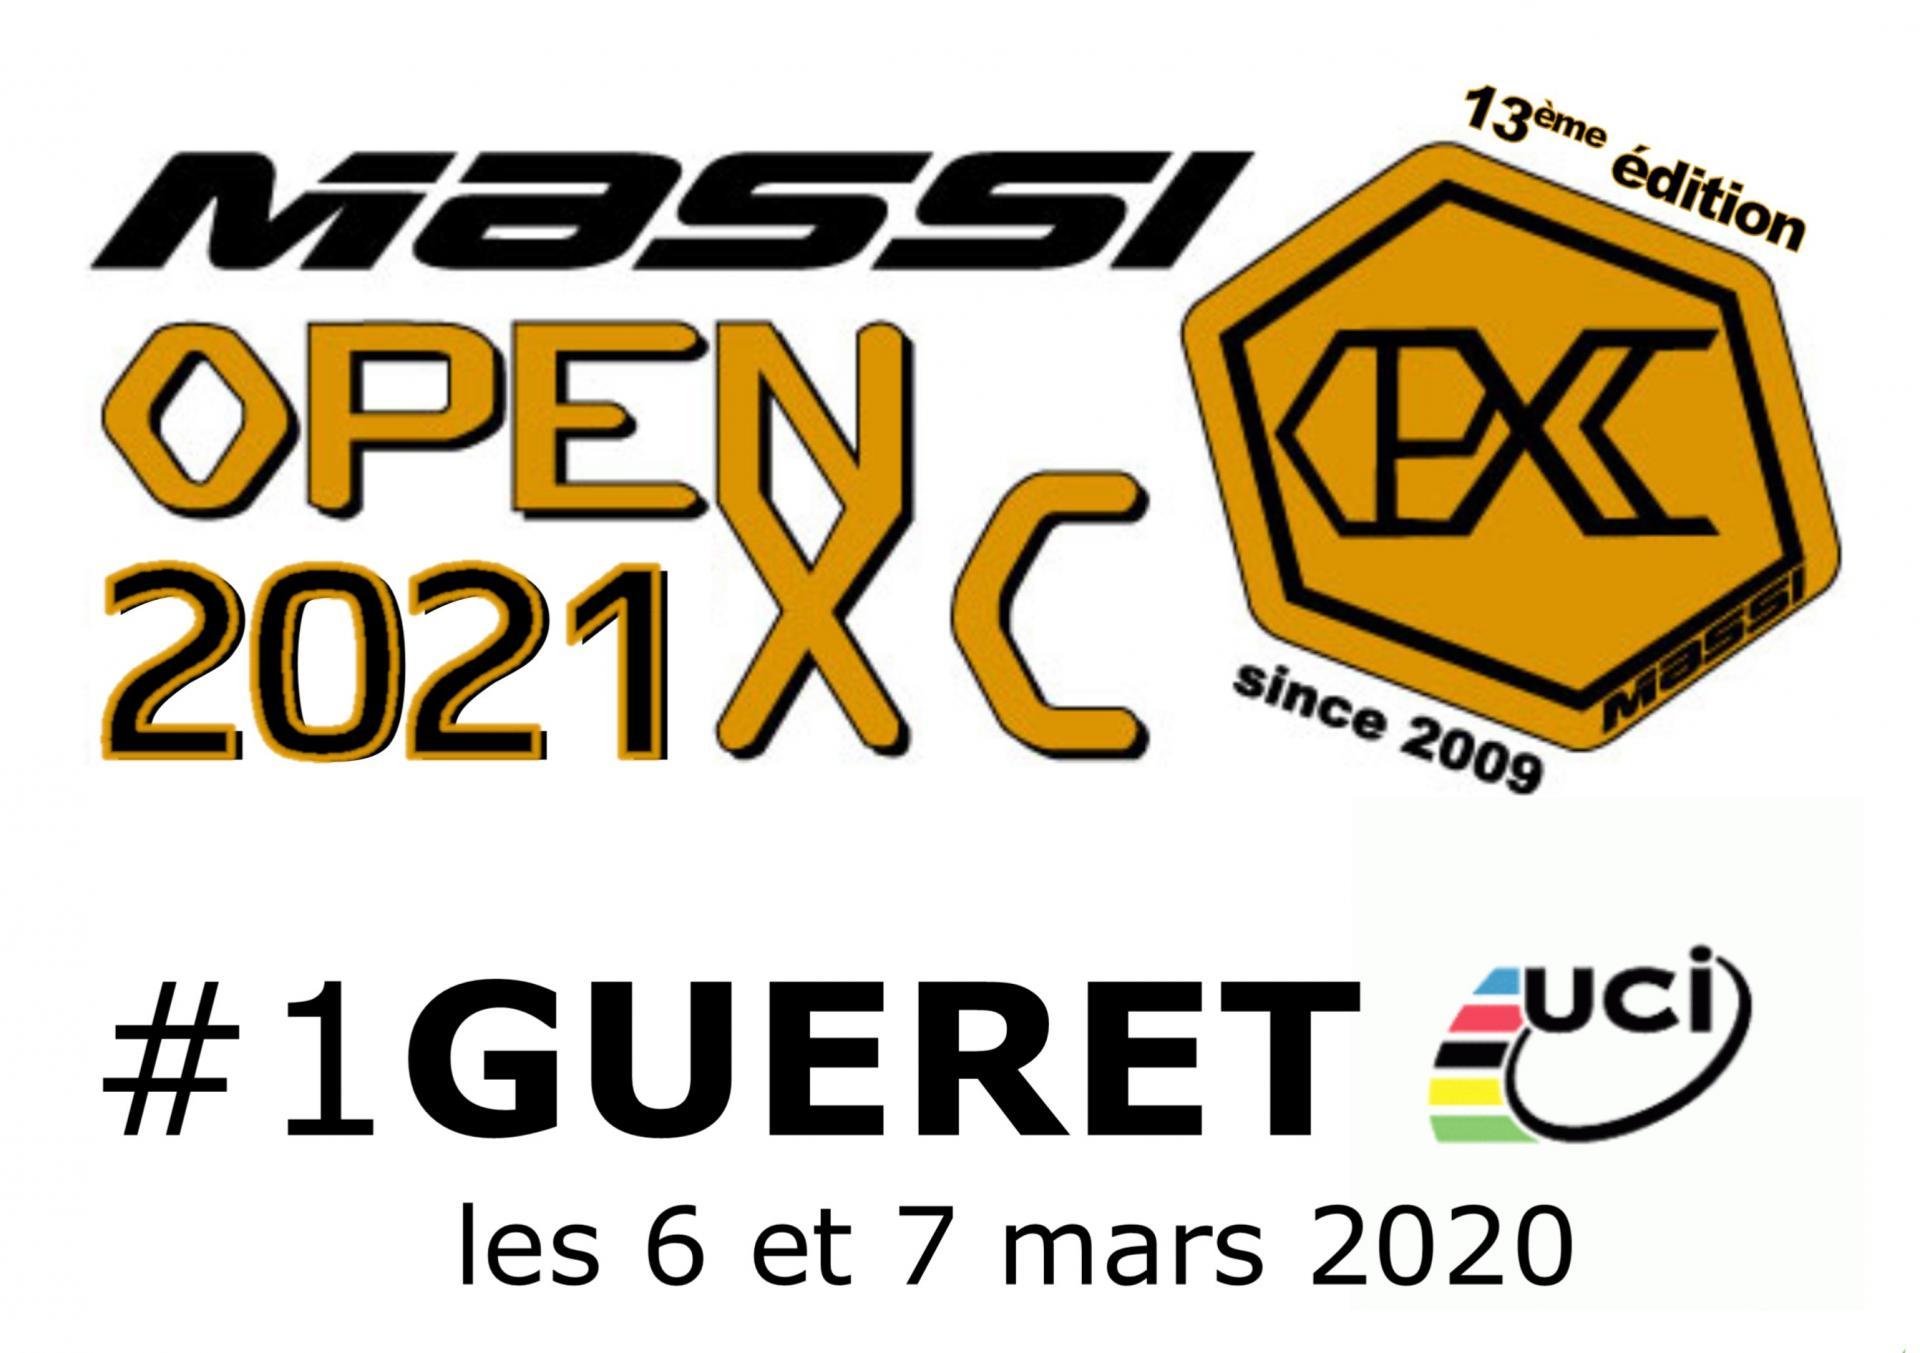 GUERET 2021